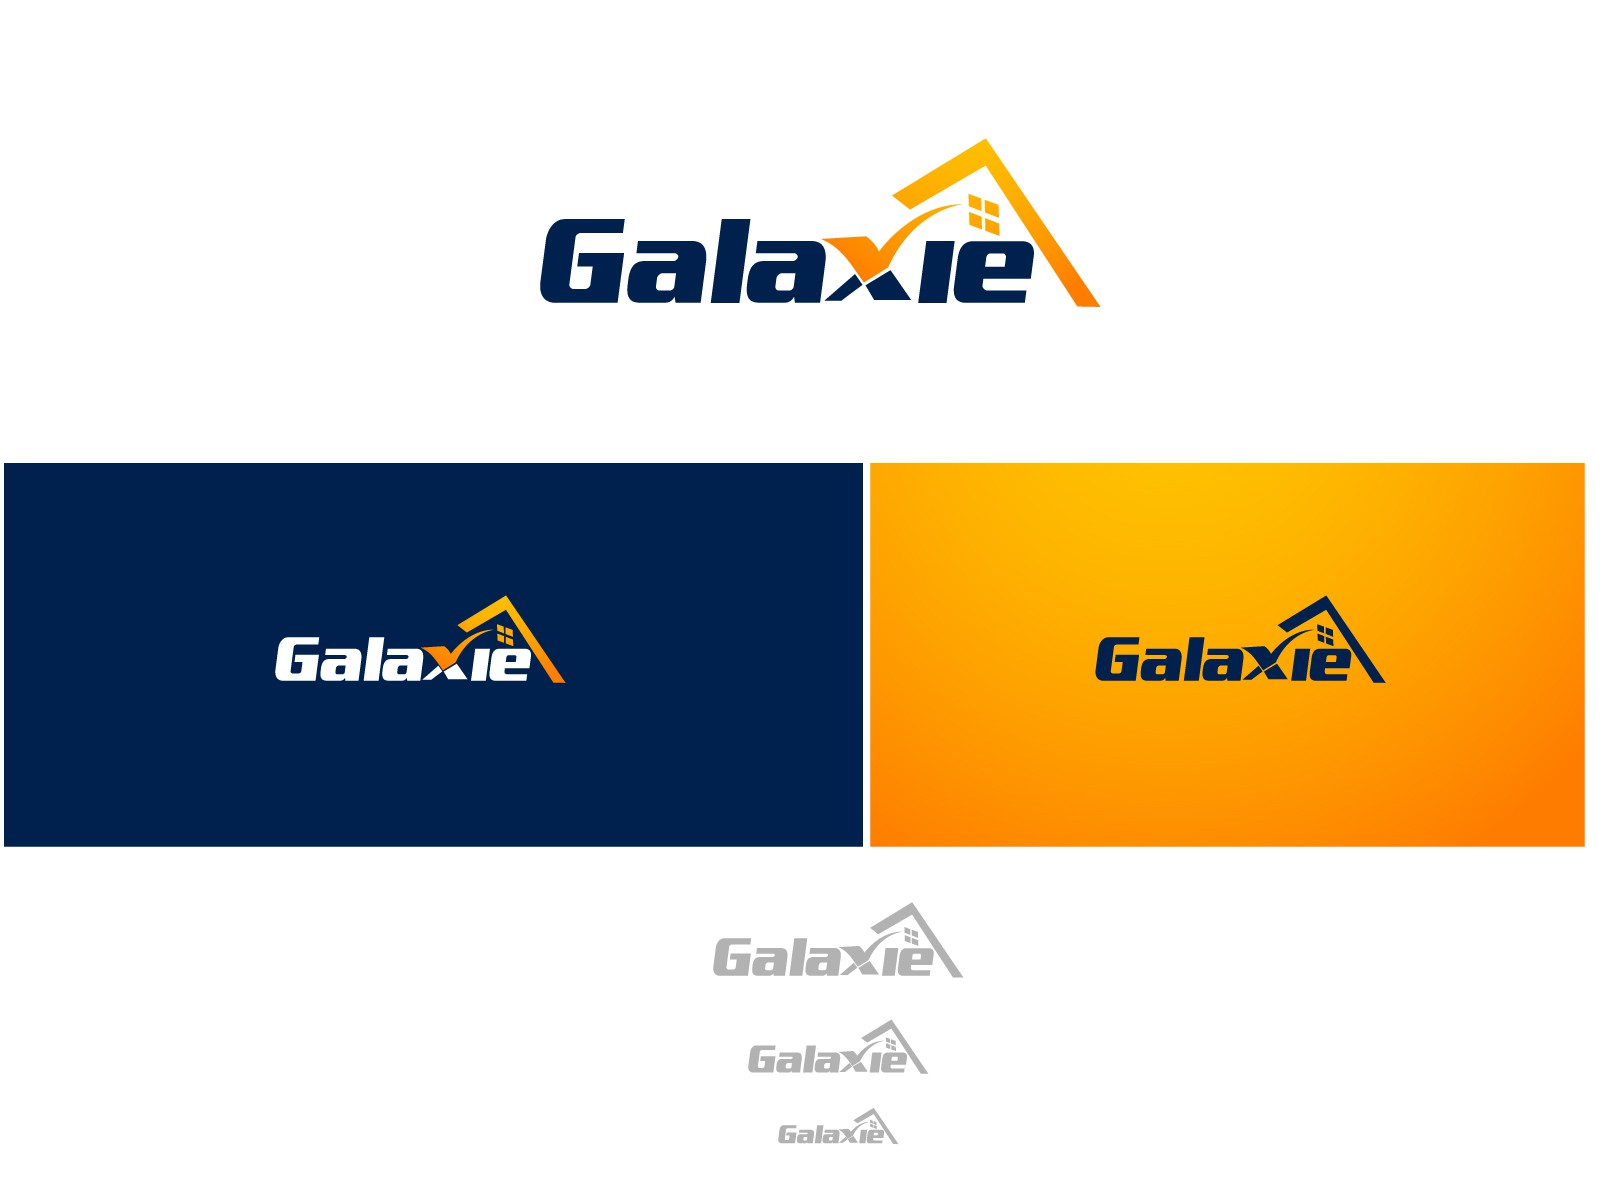 Galaxie needs a new logo